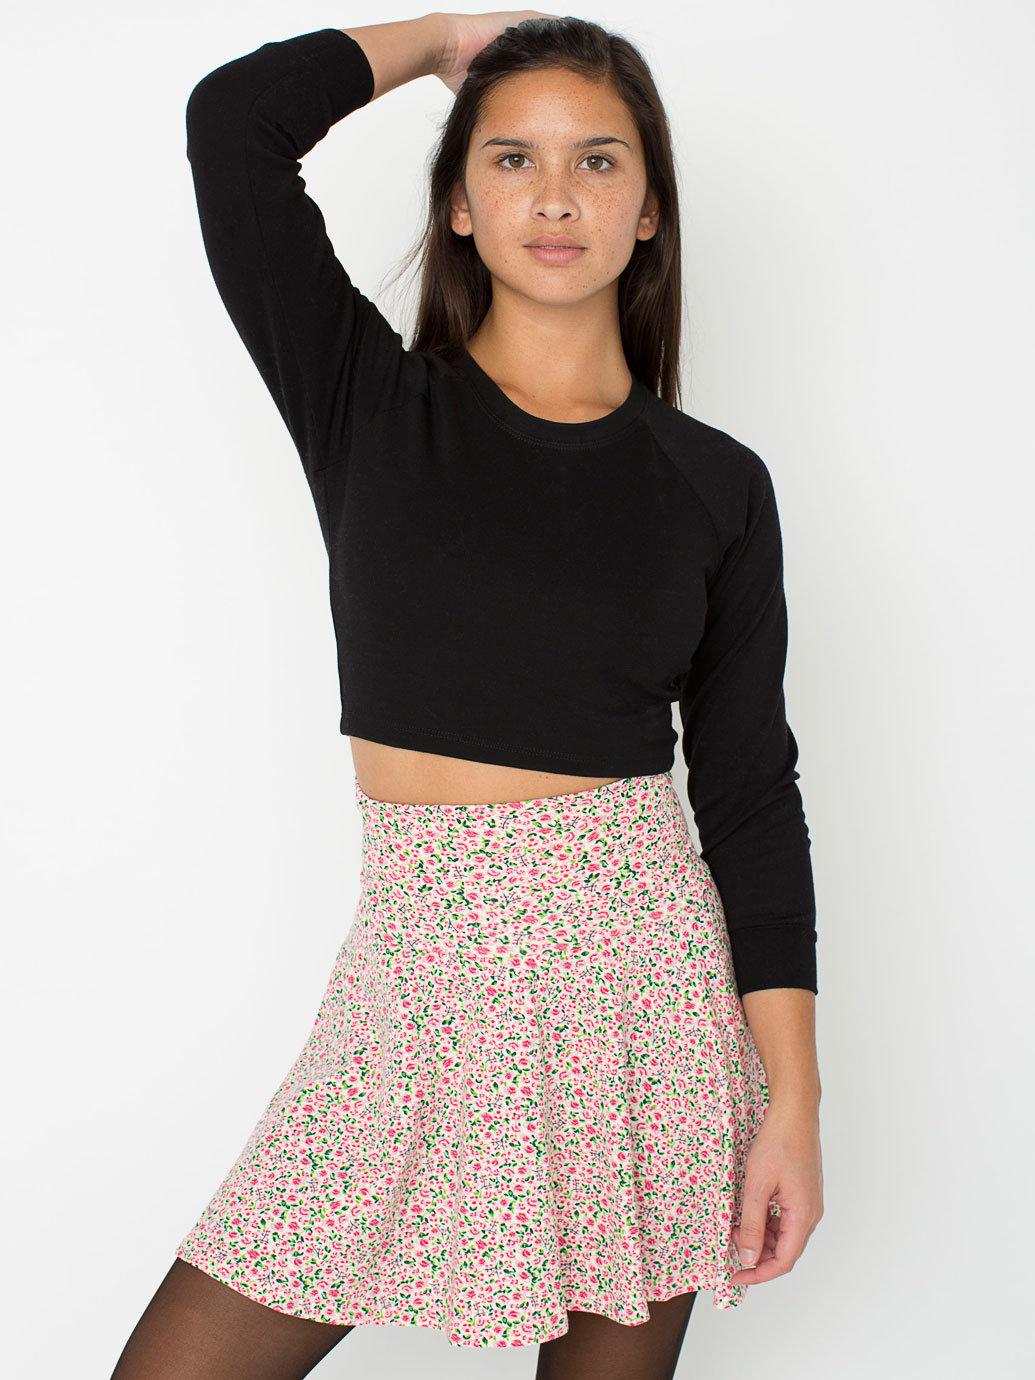 floral printed cotton spandex jersey high waist skirt